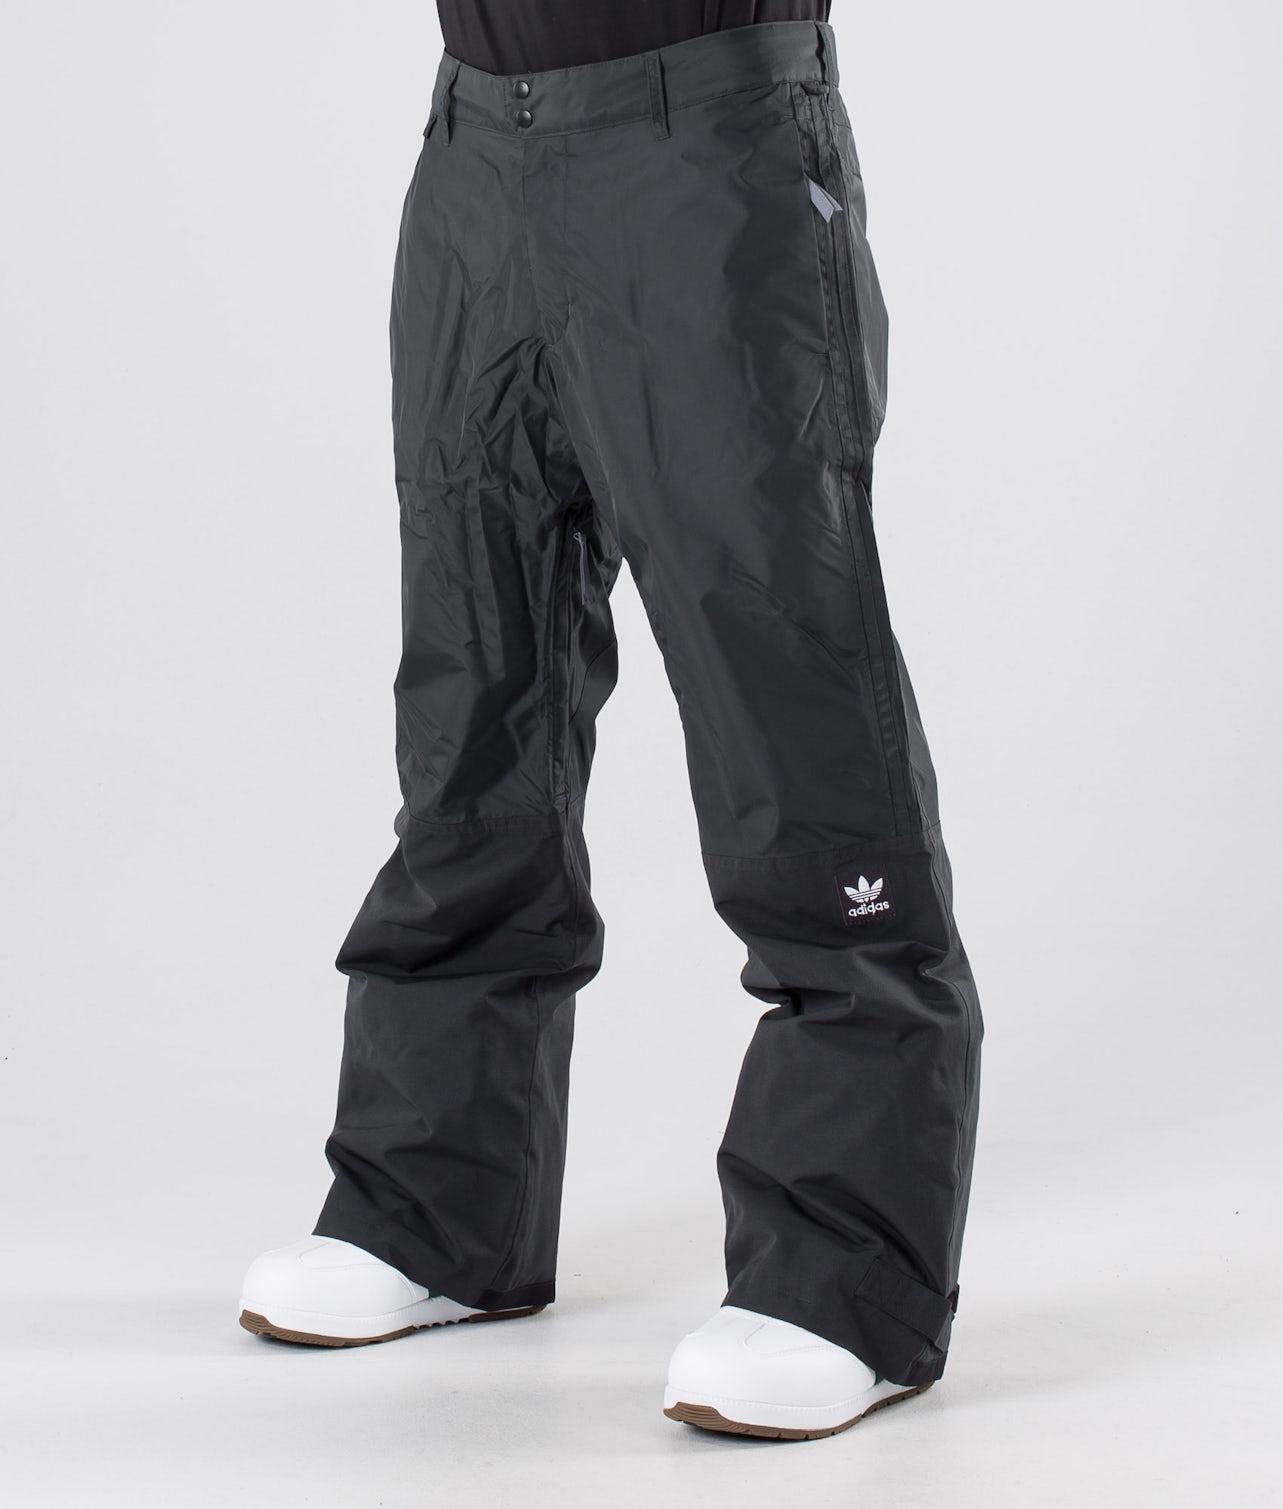 Adidas Snowboarding Riding Bukser Carbon/Cream White